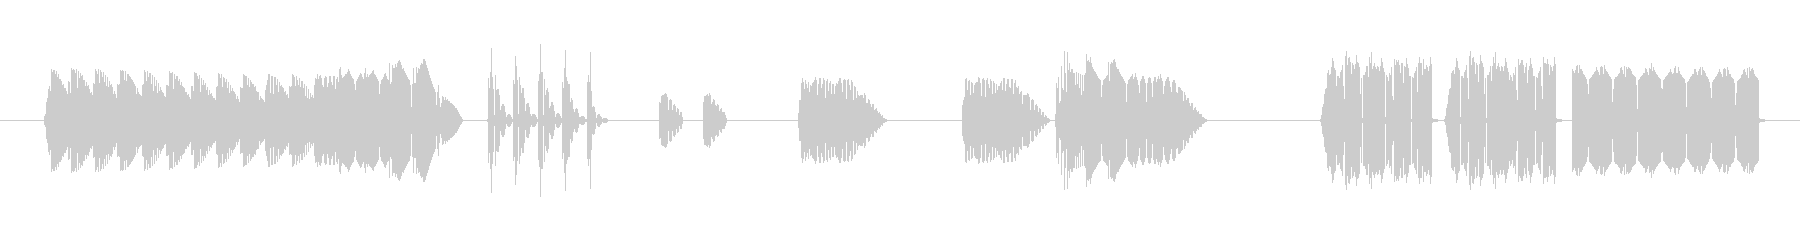 FX アーケードシューティングプレイ02の未再生の波形